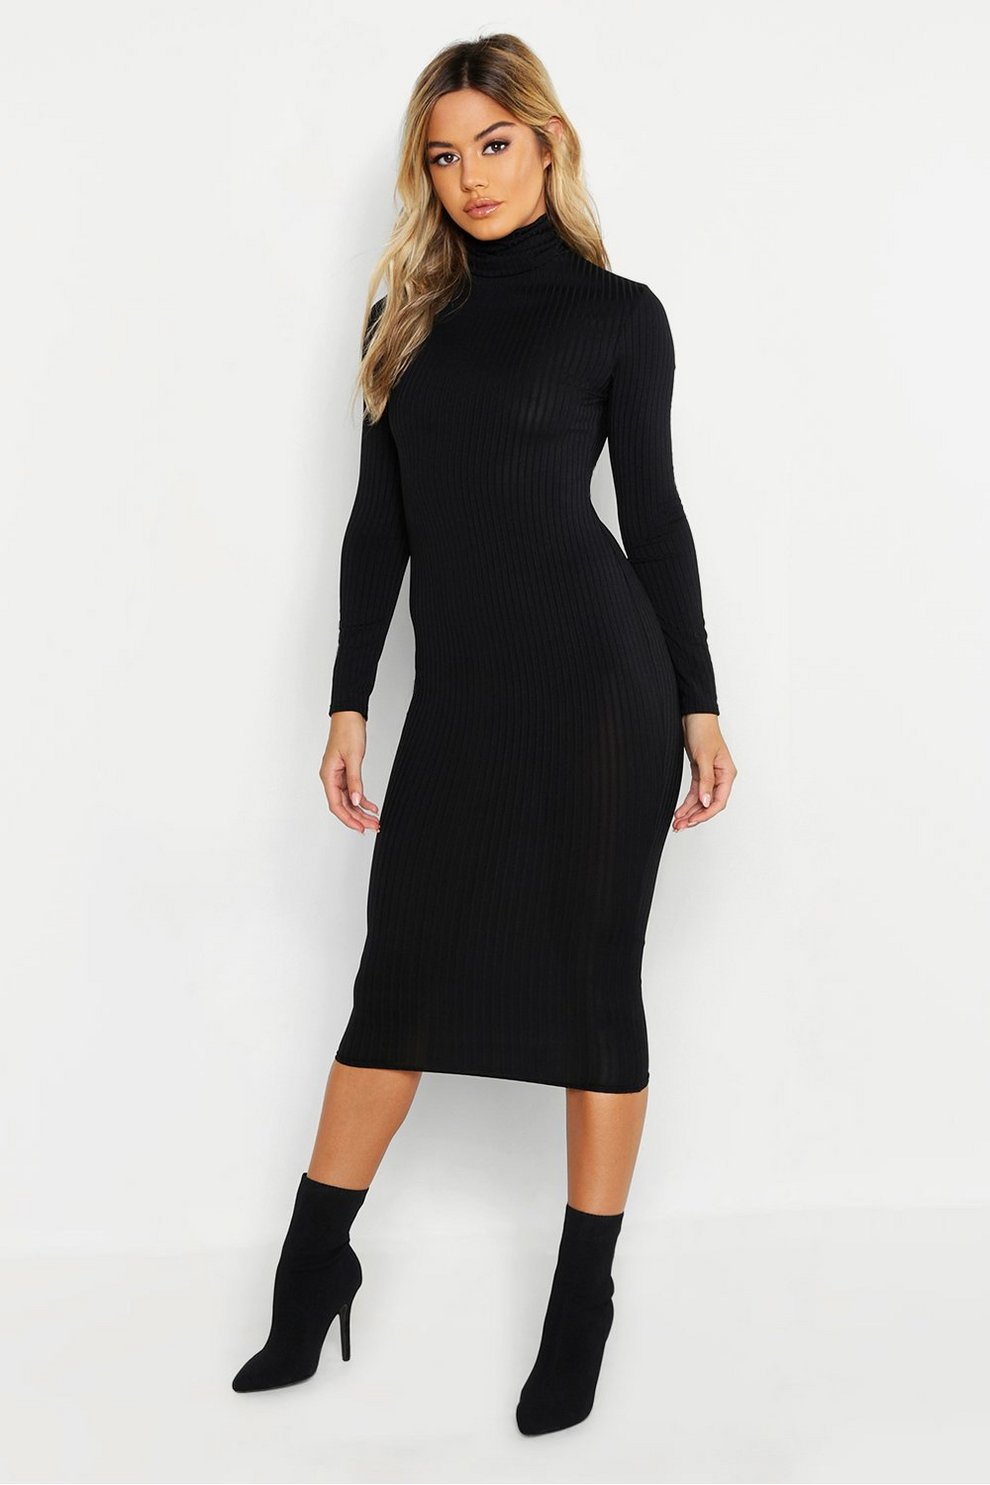 29eb888be36 Womens Black Petite Ribbed Neon Roll Neck Midi Dress